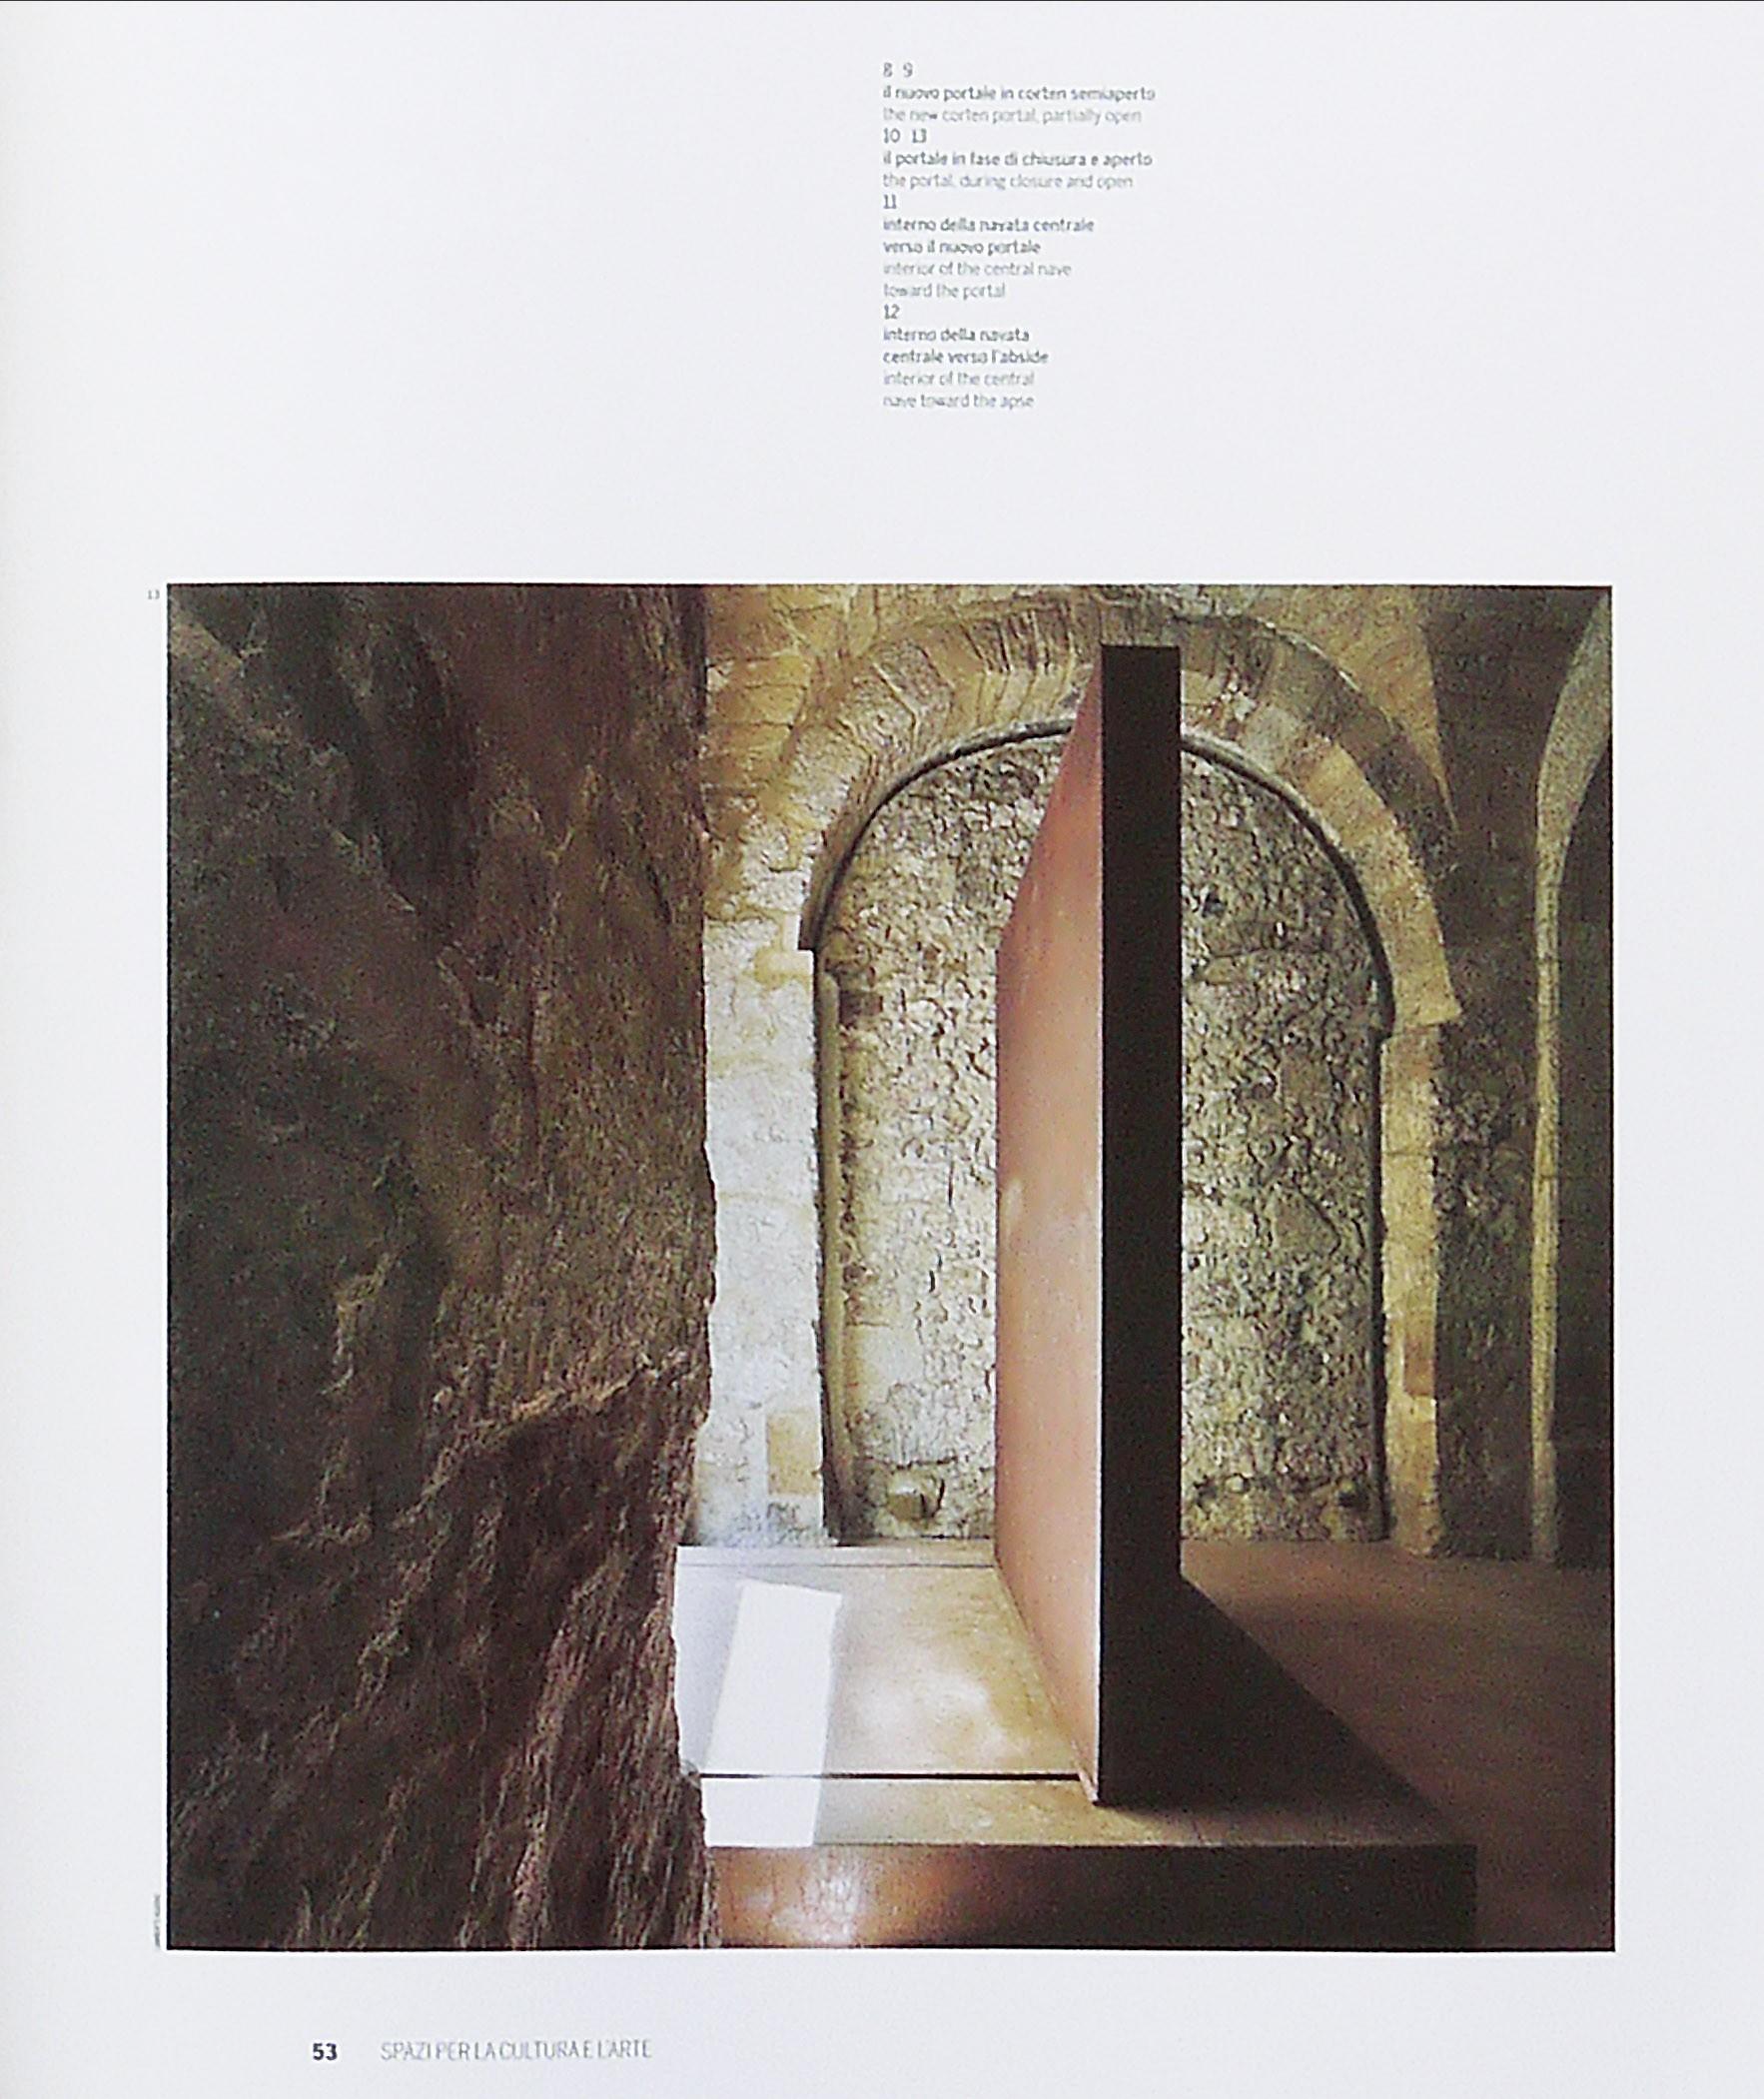 Casabella 780. Arch. Emanuele Fidone - San Pietro, Siracusa